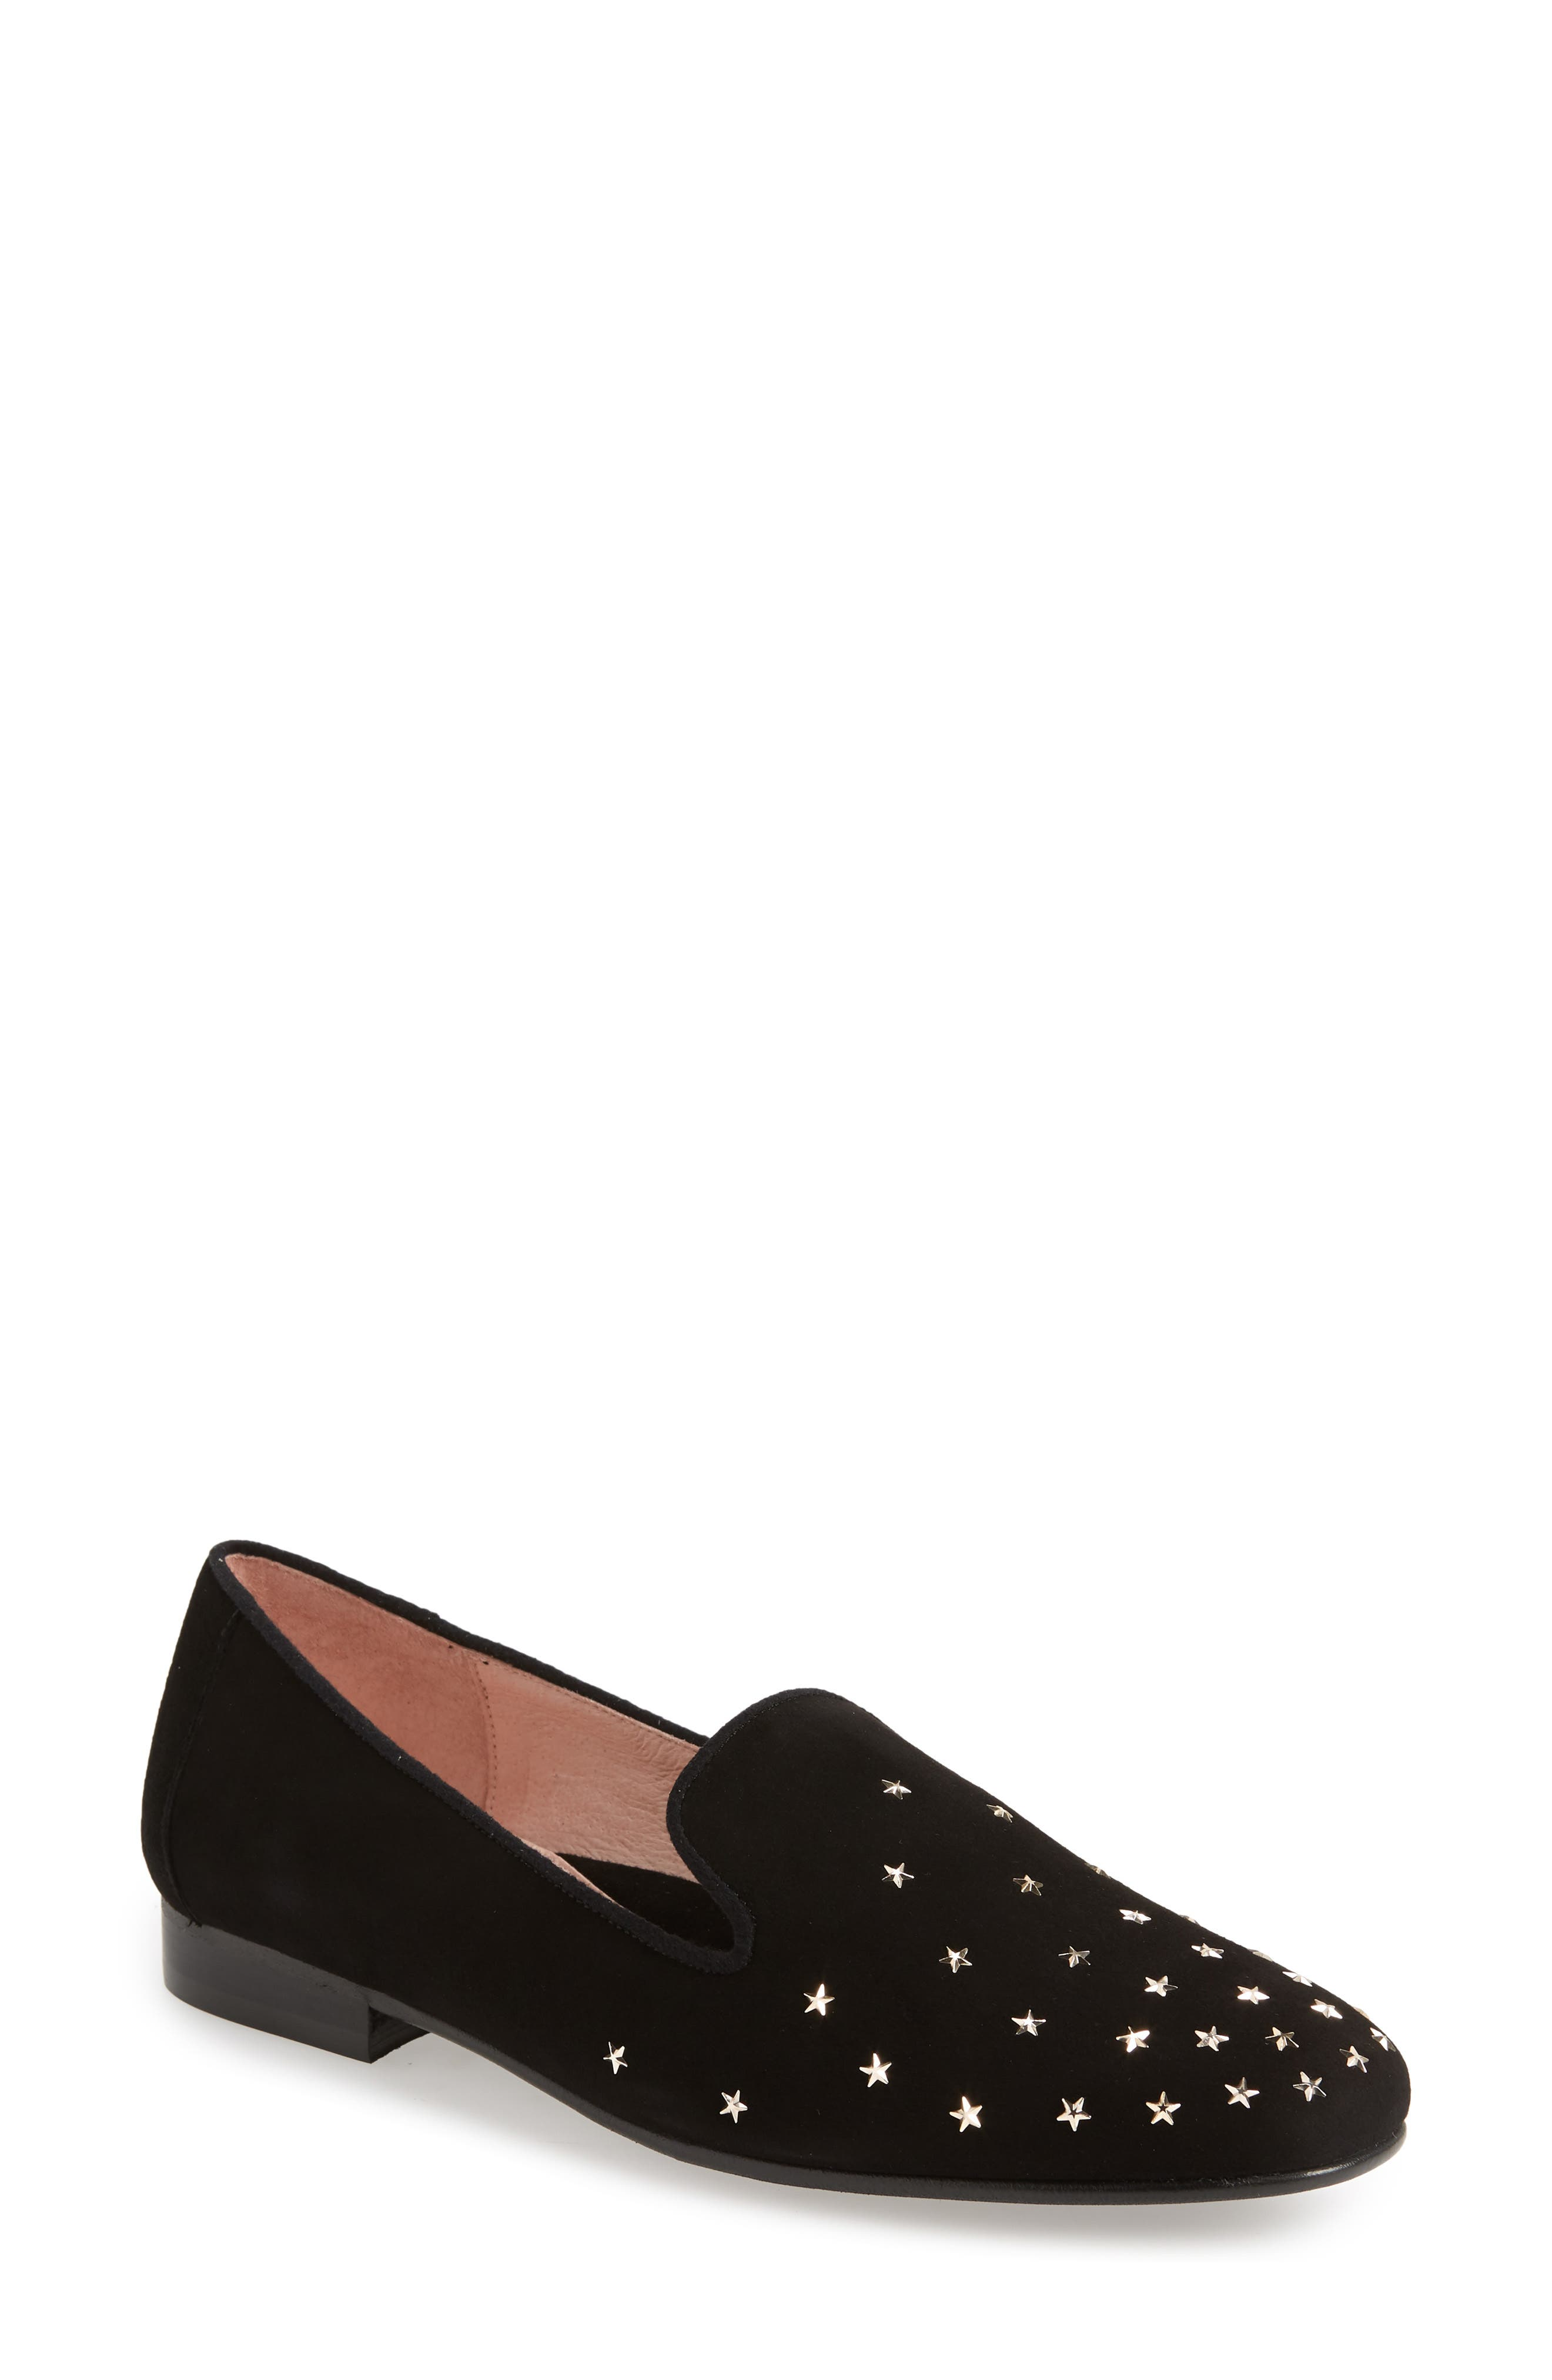 Patricia Green Celeste Star Studded Loafer, Black